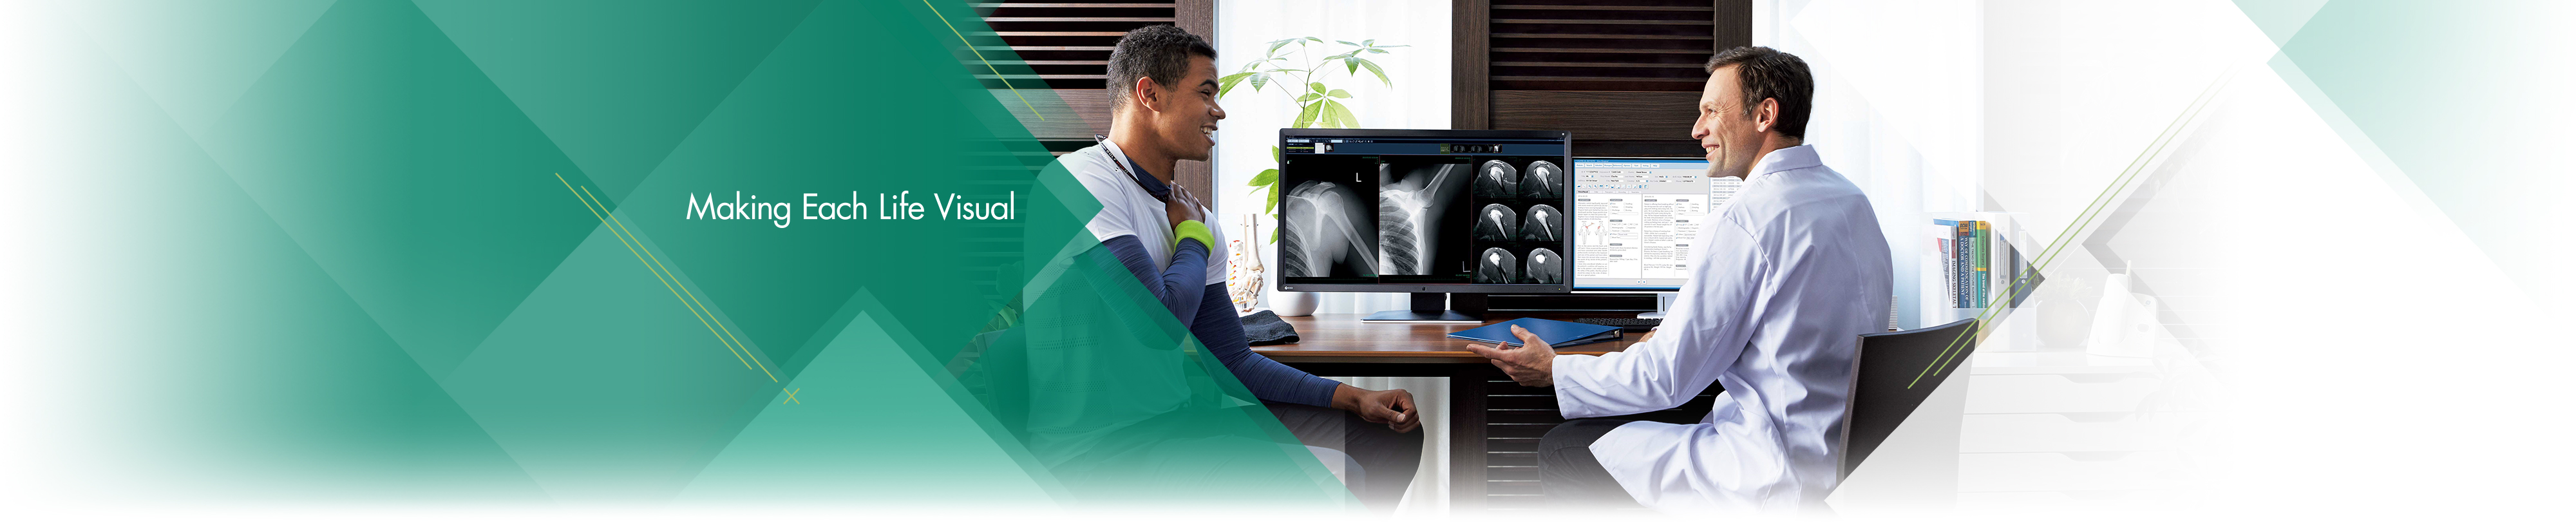 Healthcare Diagnostics and Examinations | EIZO